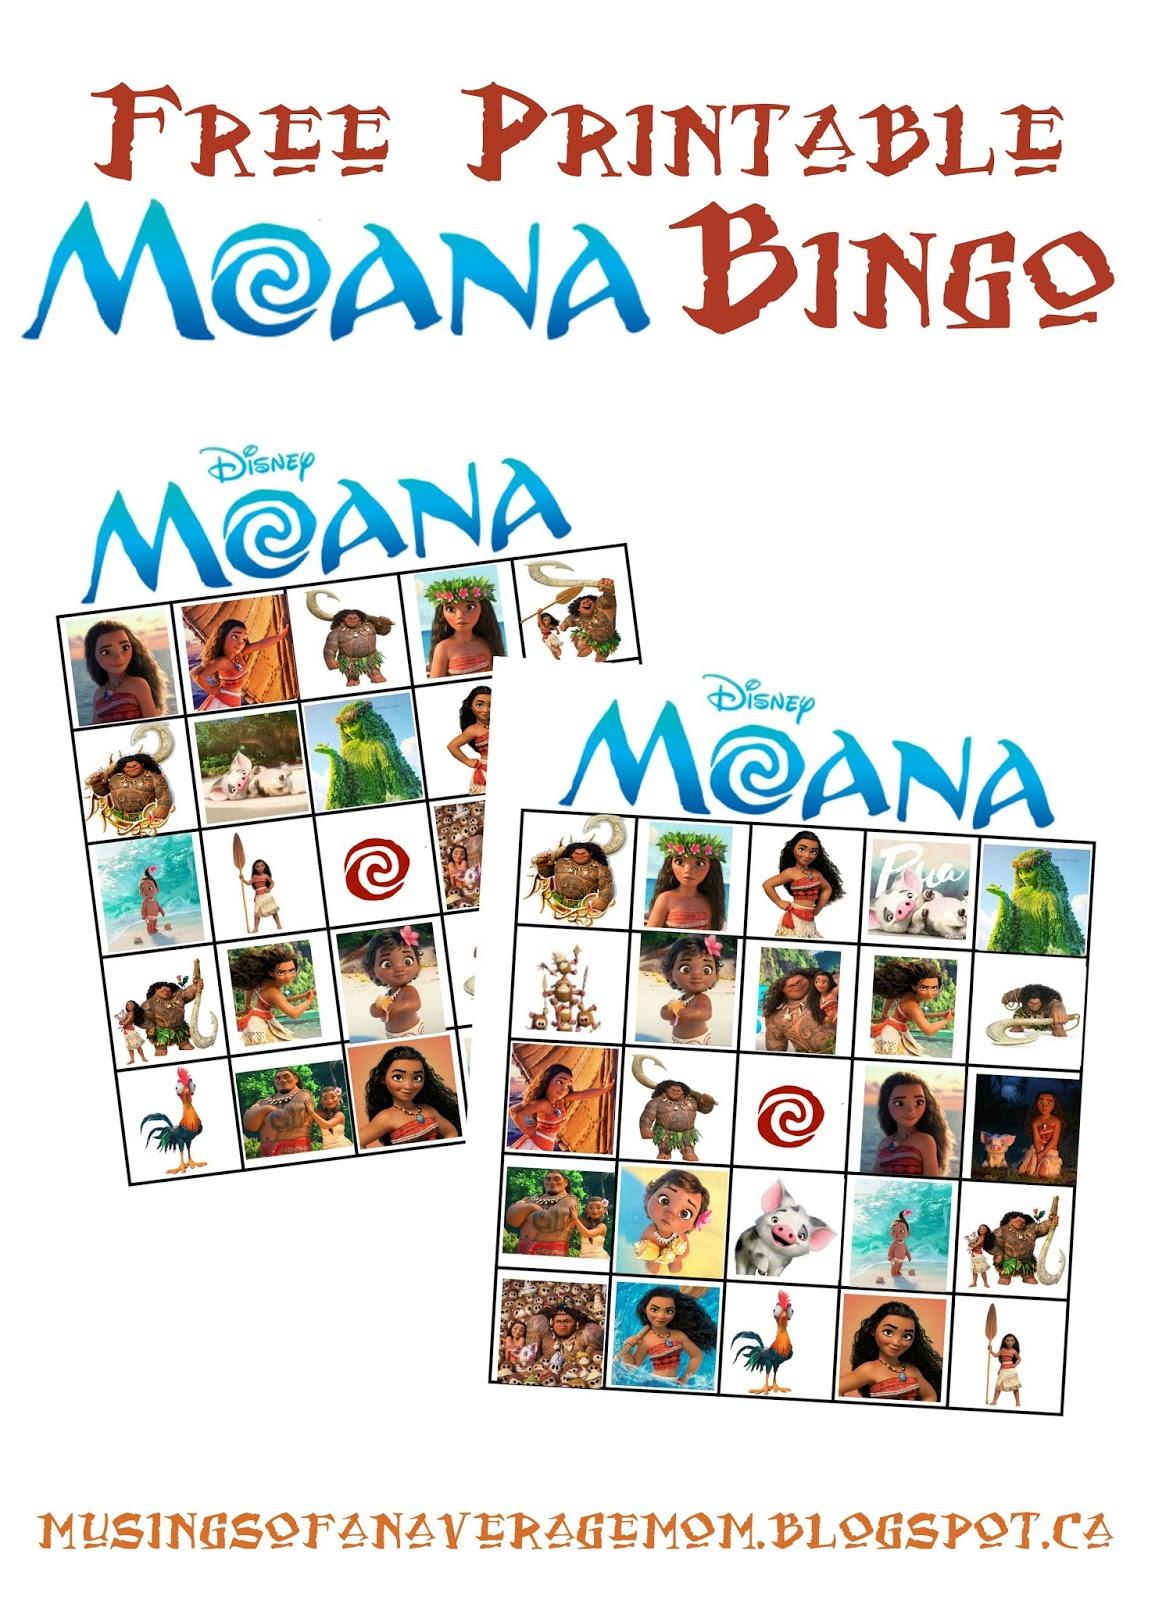 Musings Of An Average Mom: Moana Bingo